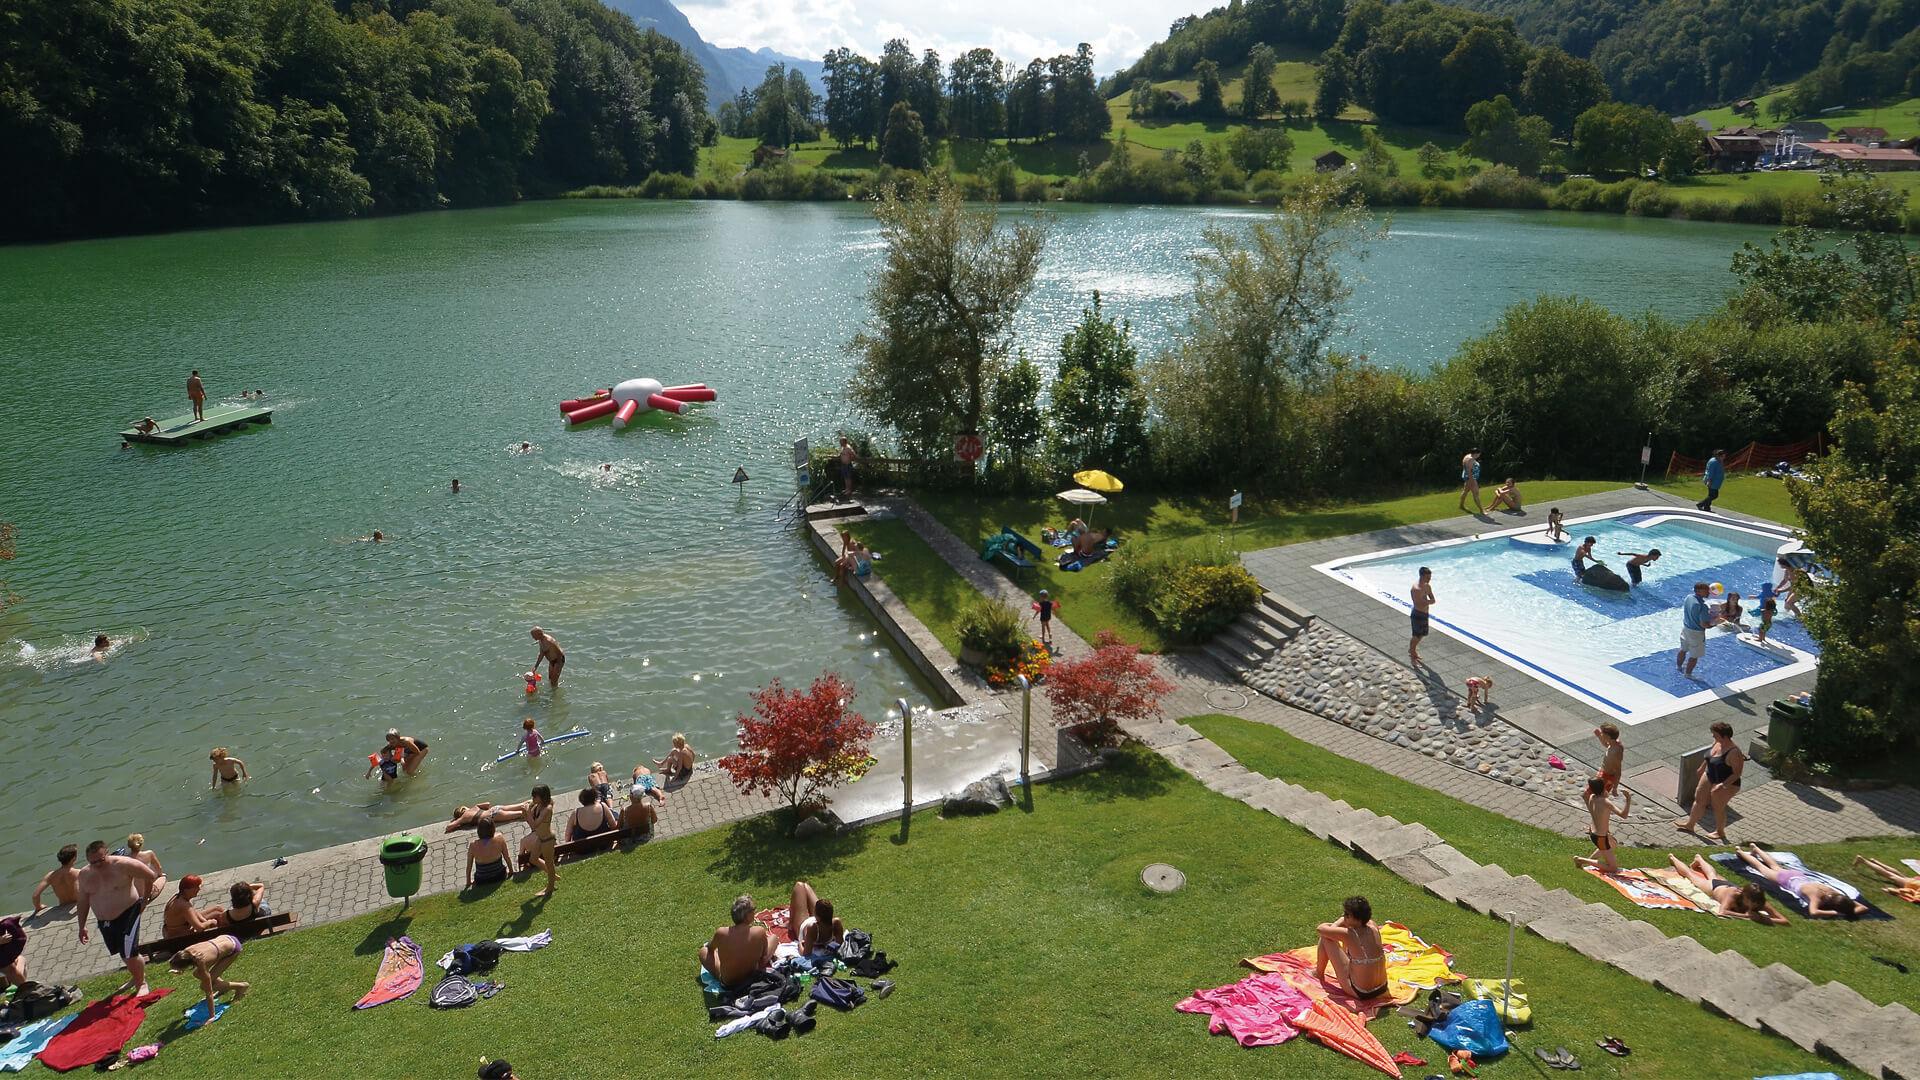 ringgenberg-naturstrandbad-burgseeli-sommer-betrieb-besucher